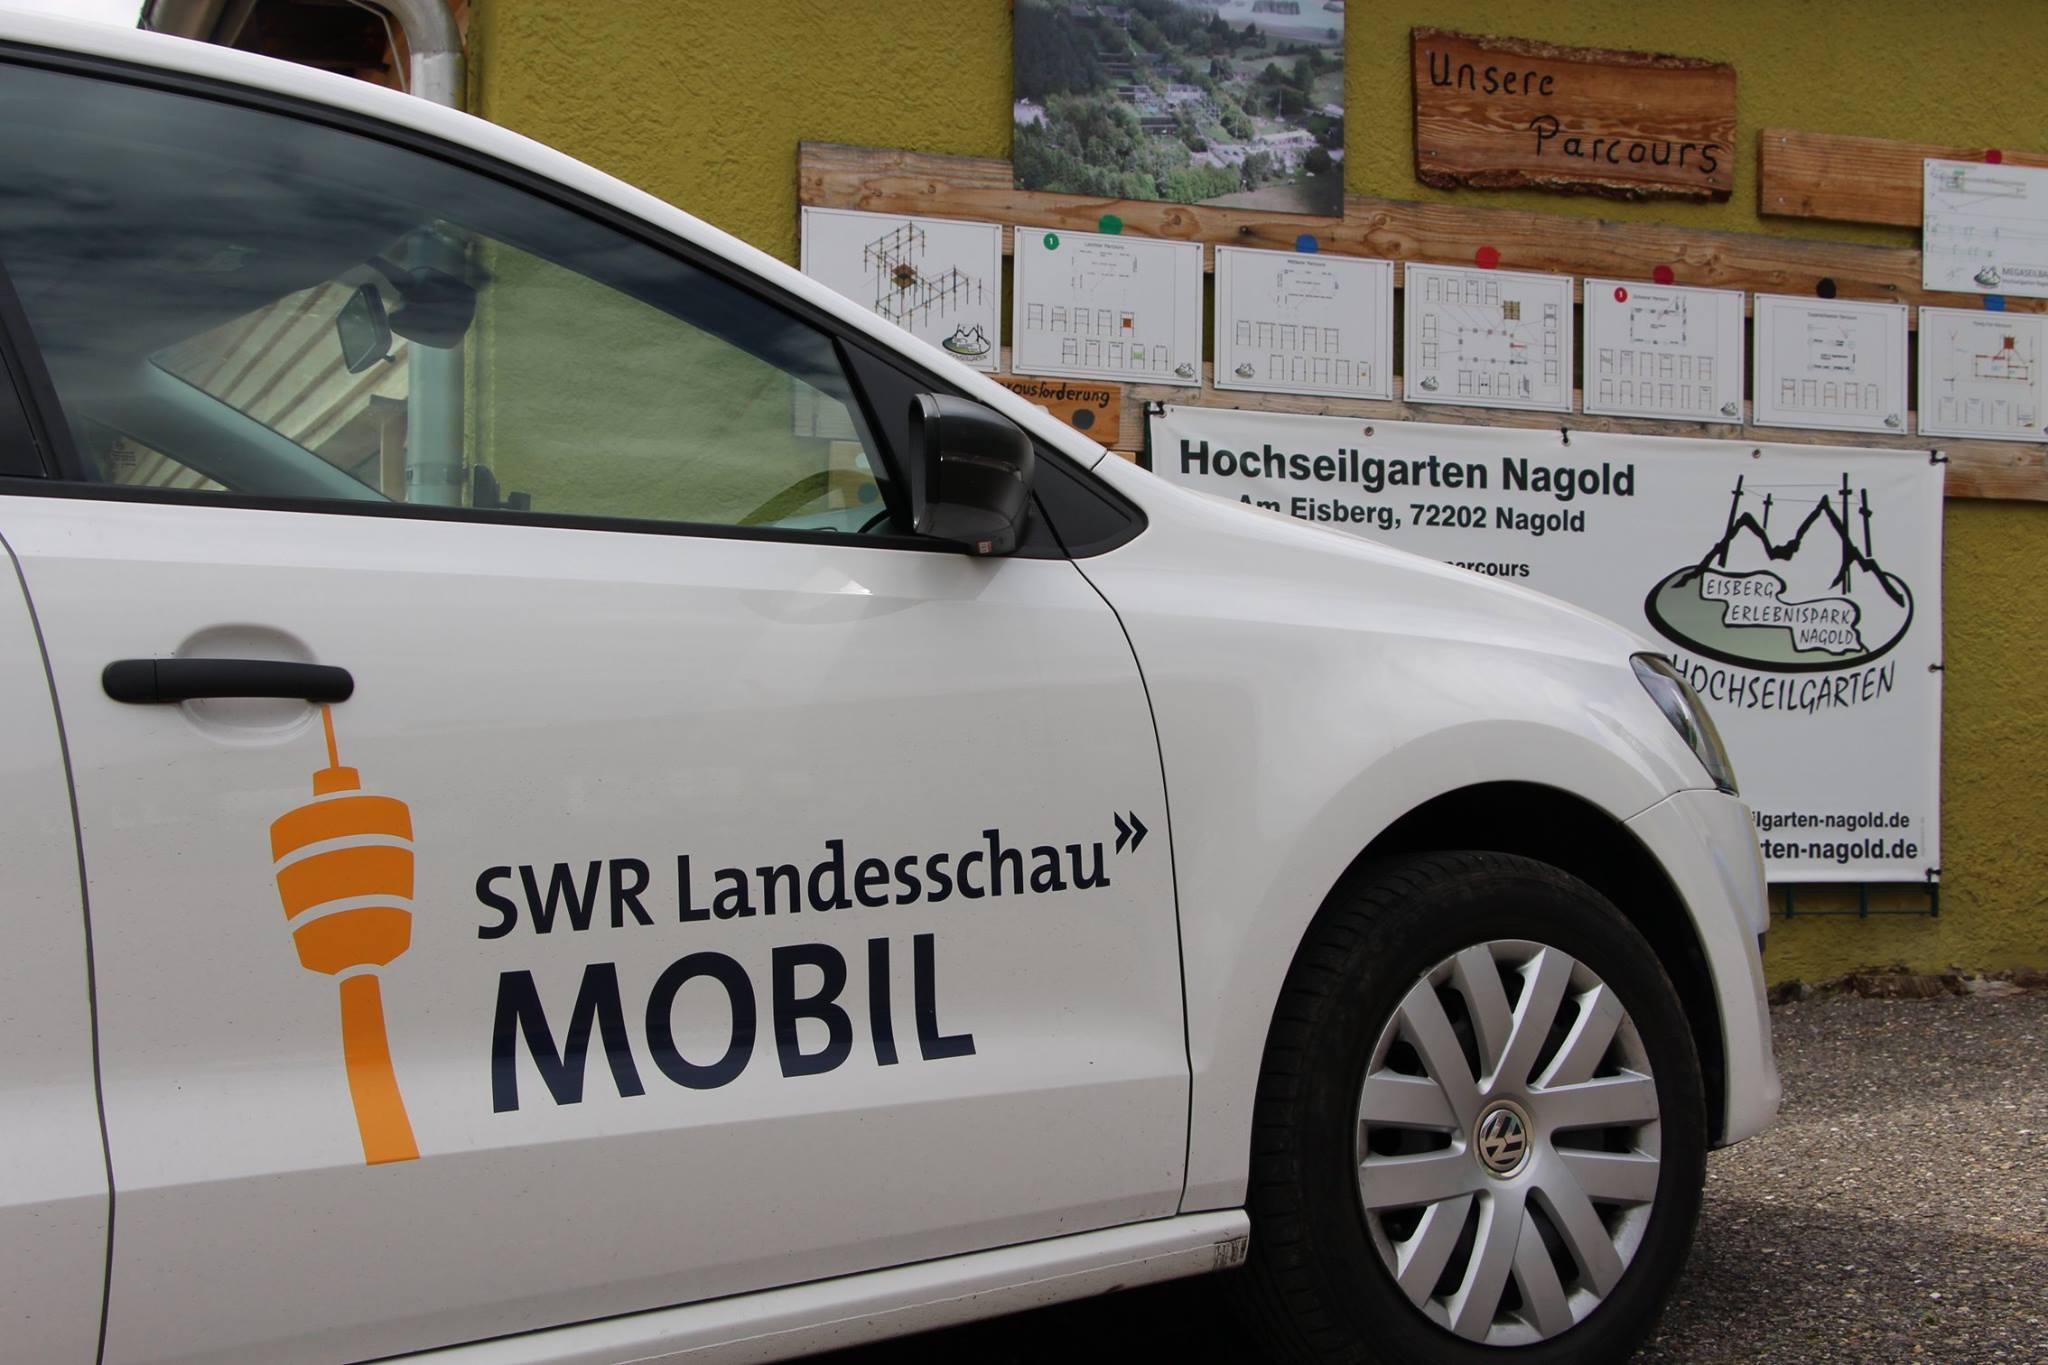 SWR Landesschau mobil